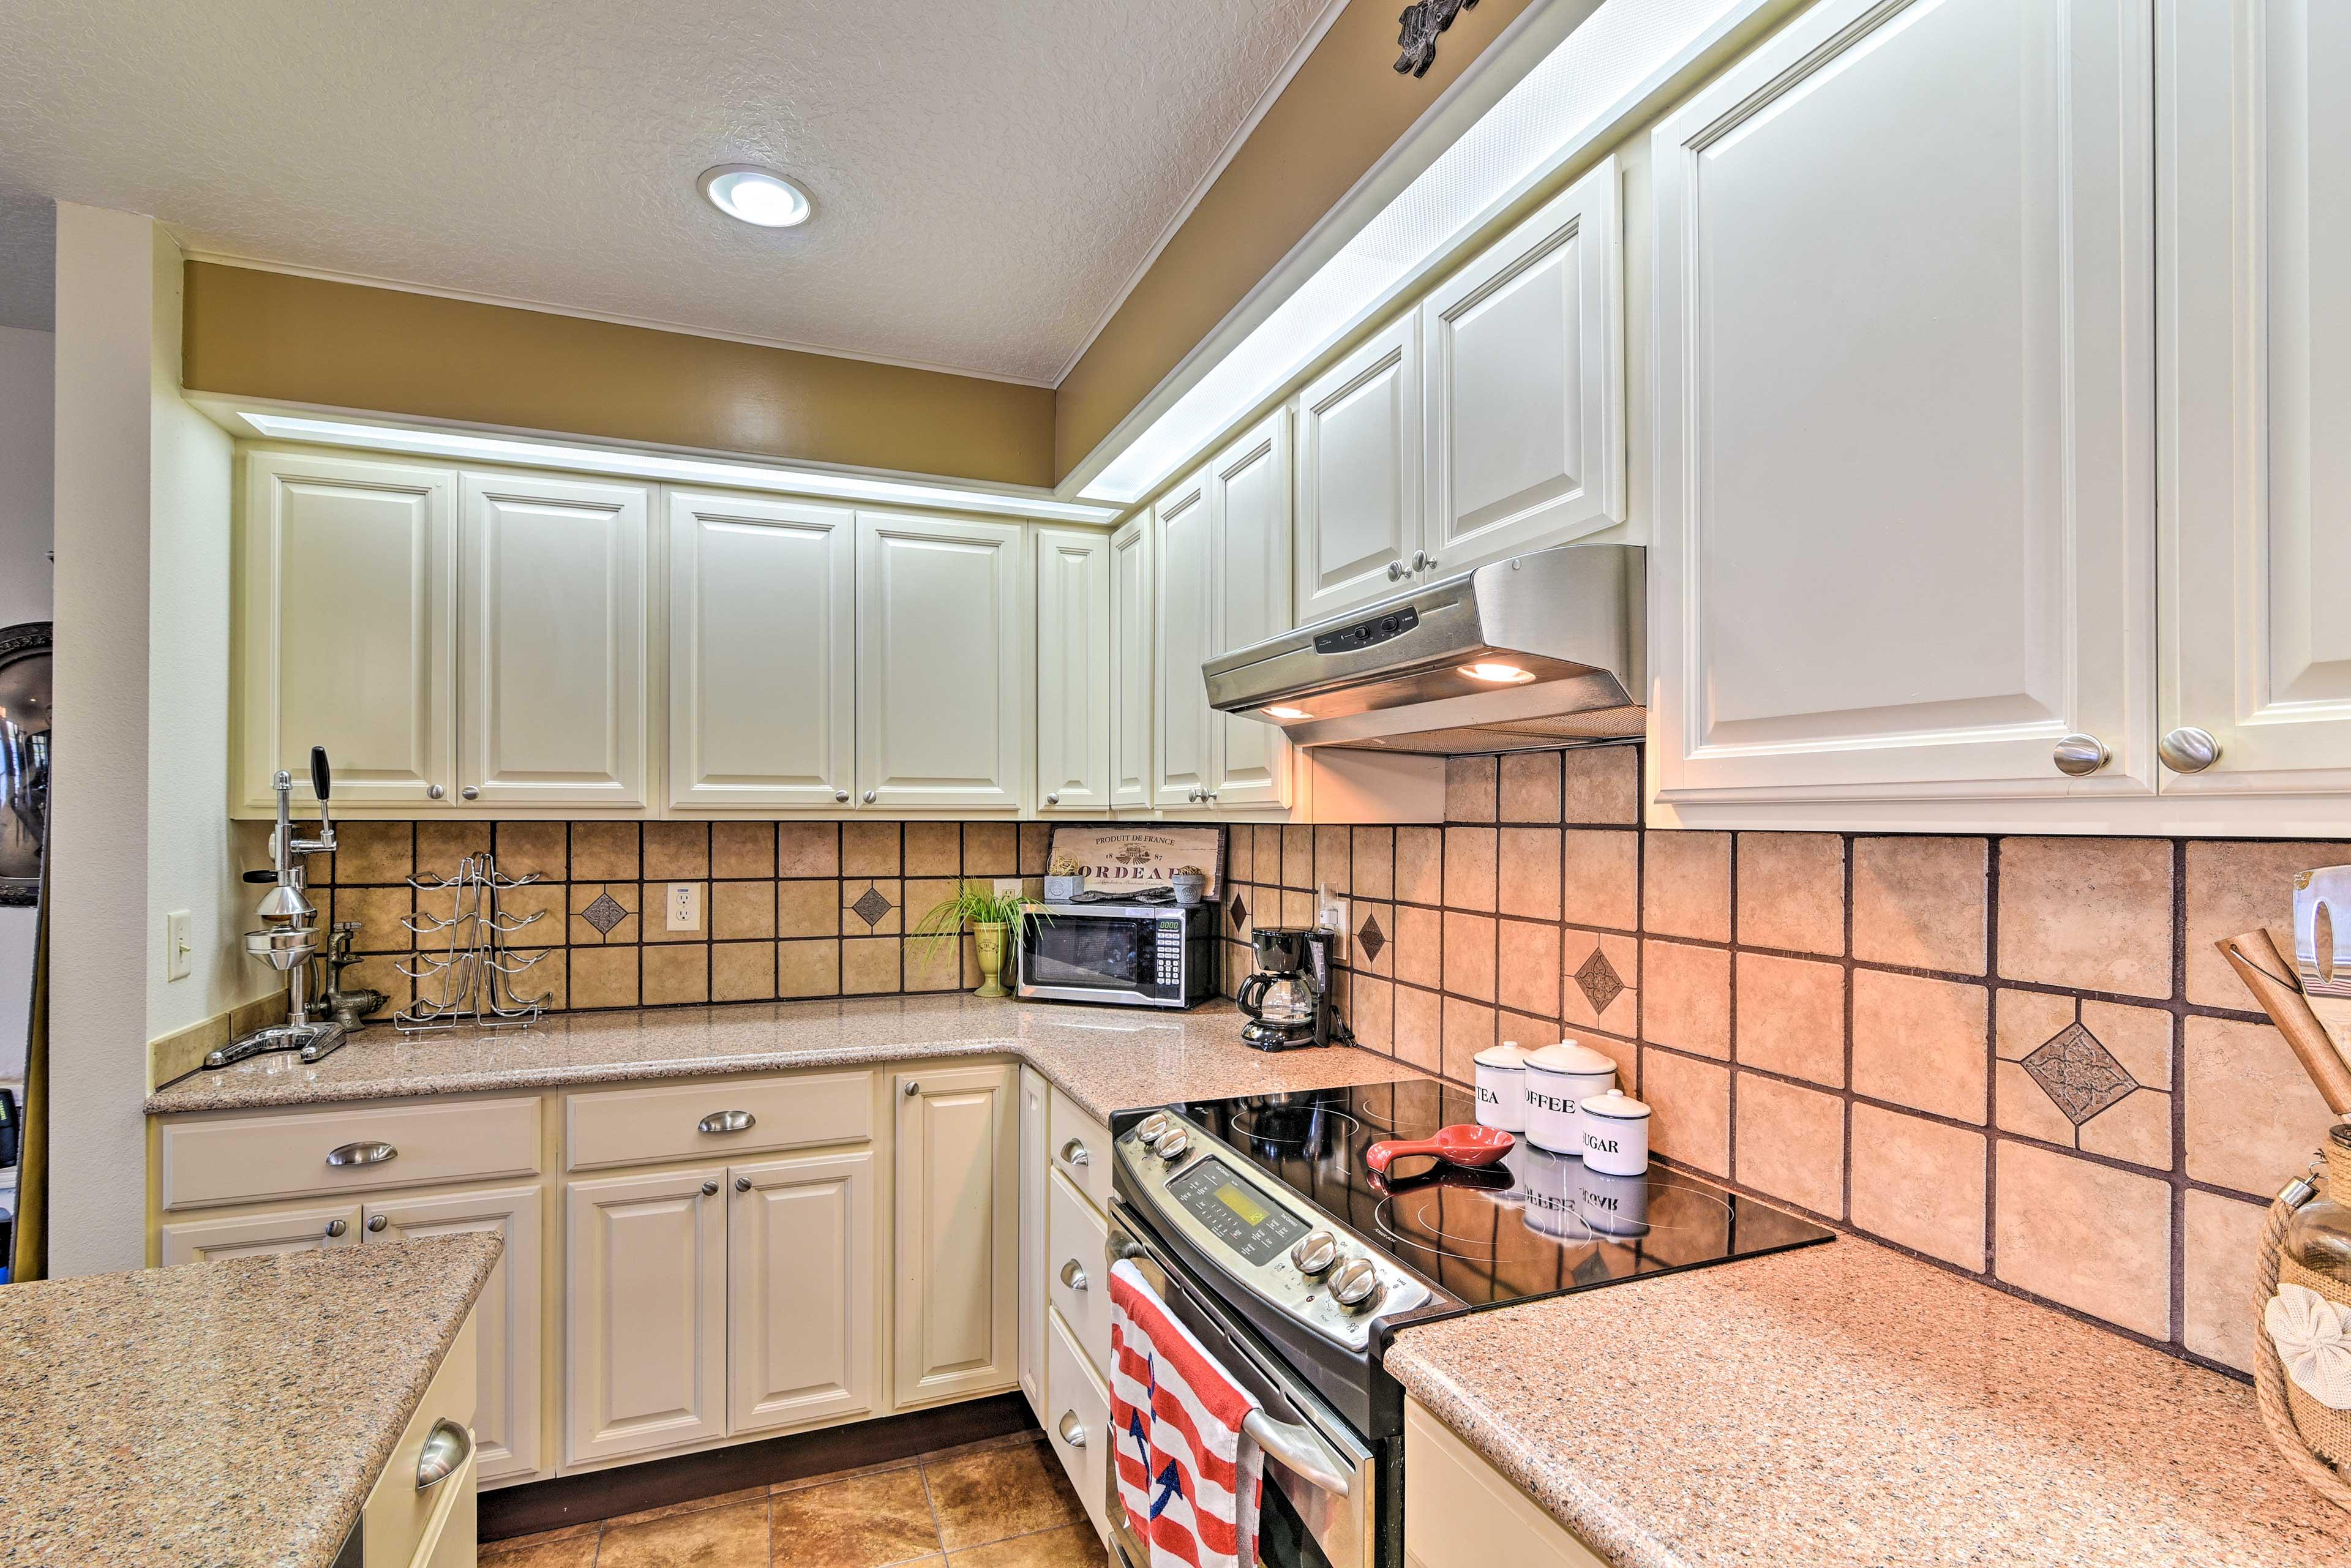 The tile back splash gives the kitchen a high-end finish!